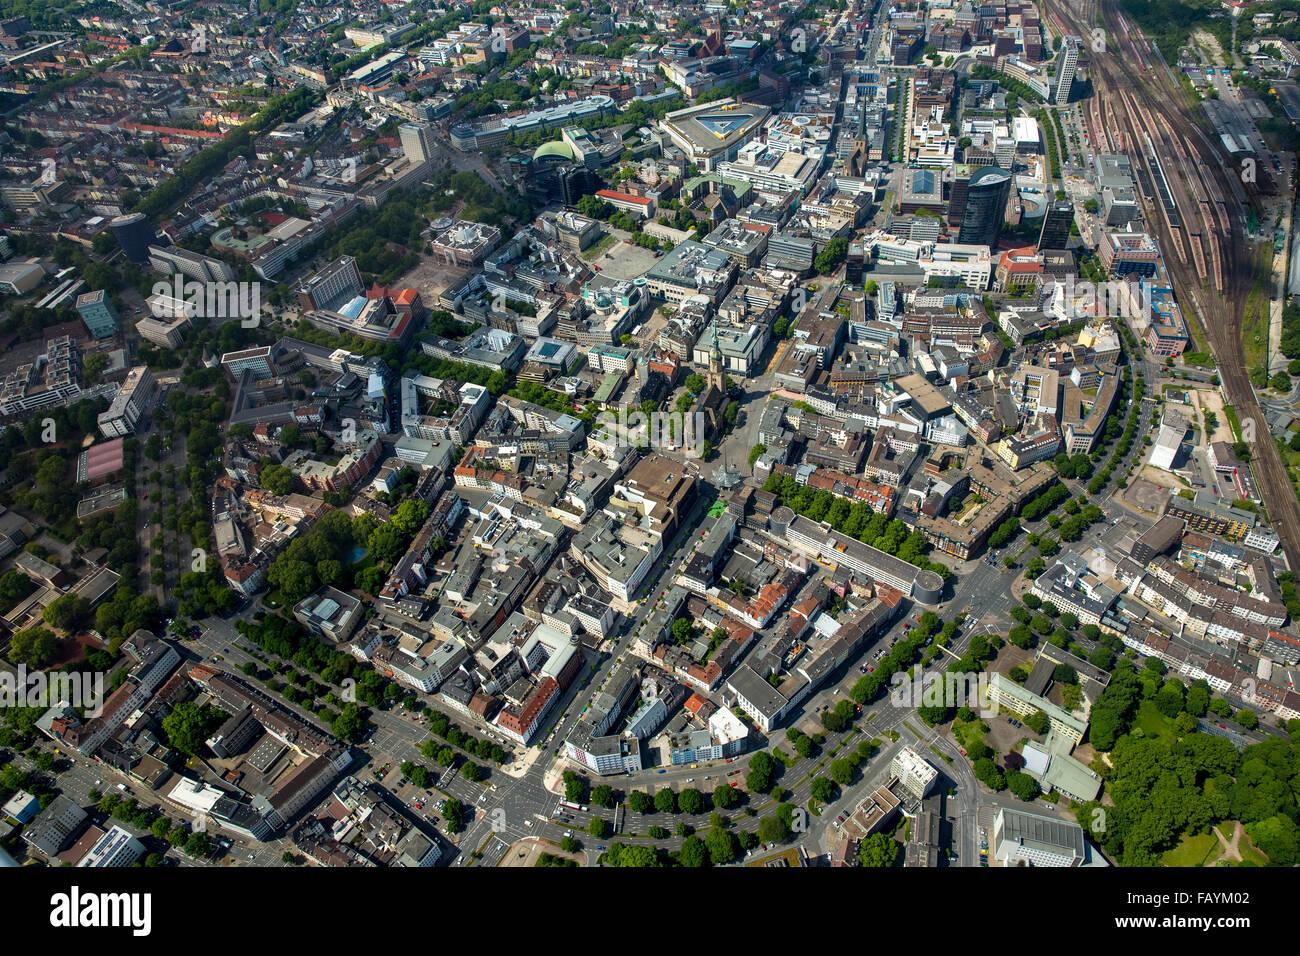 Aerial view, Dortmund City inner city ringroad within the ramparts, Dortmund, Ruhr area, North Rhine-Westphalia, - Stock Image